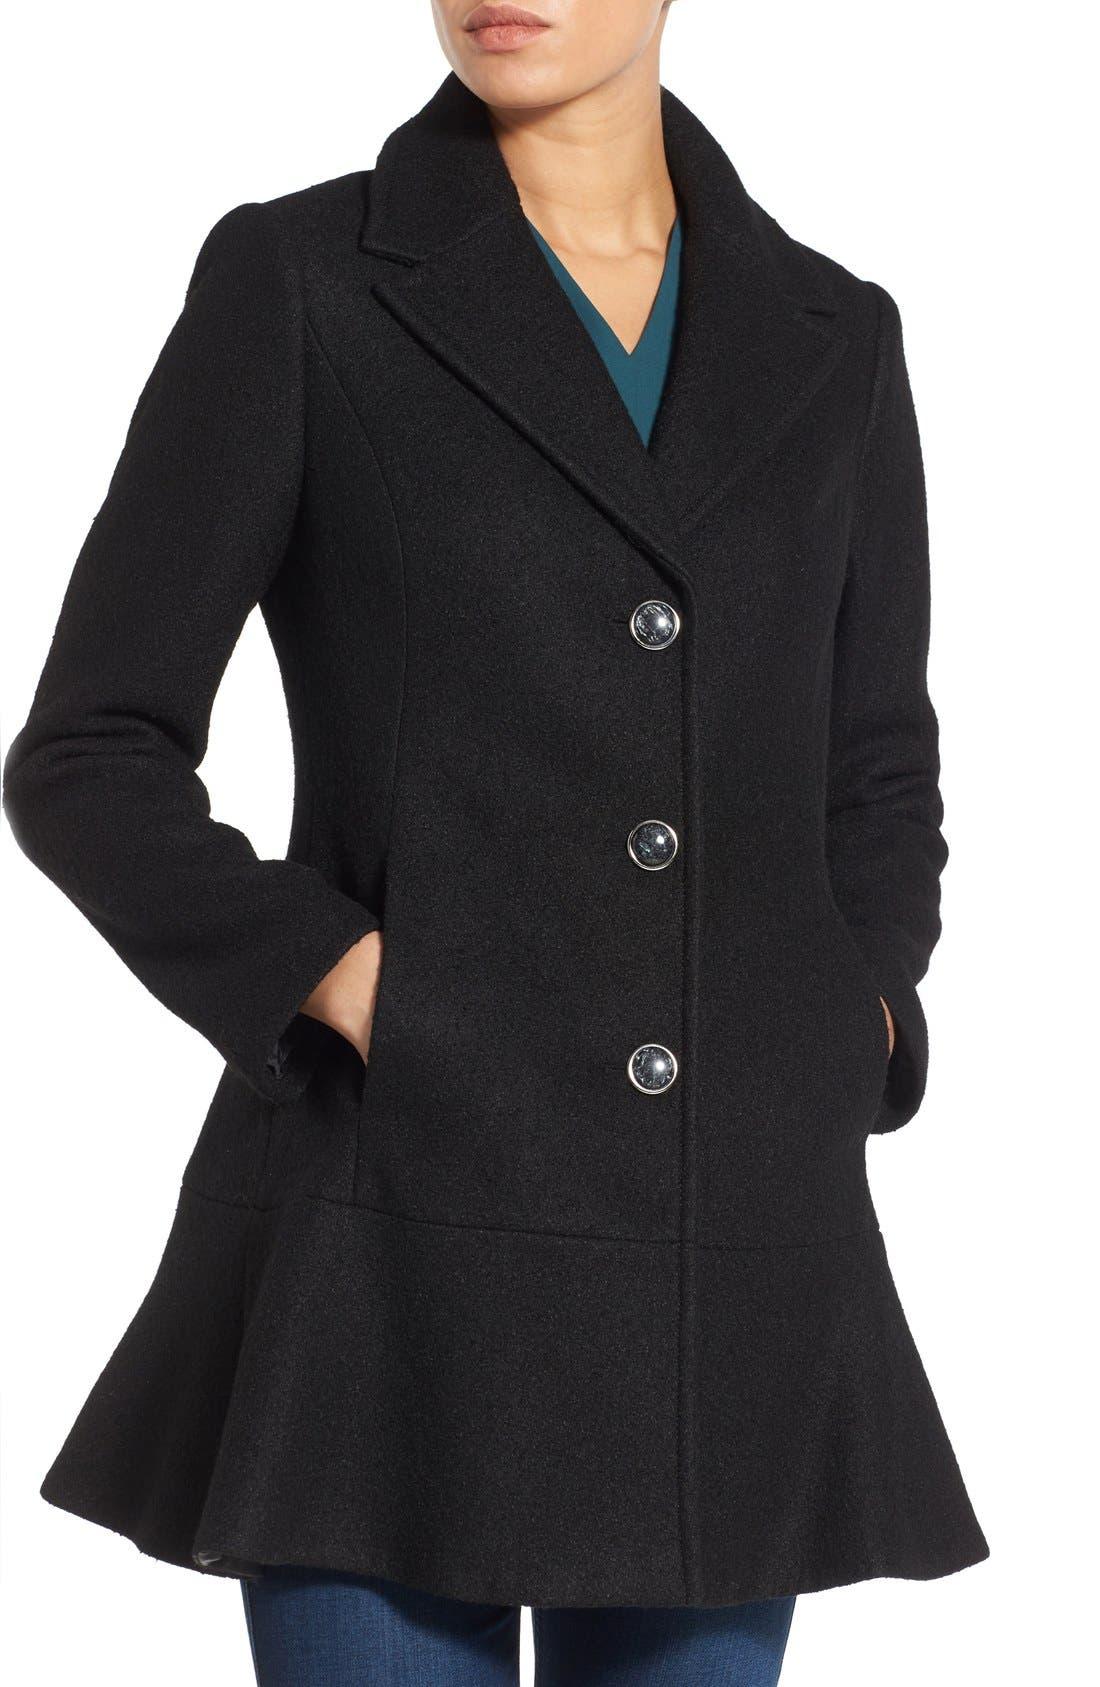 Notch Lapel Peplum Coat,                             Main thumbnail 1, color,                             Black